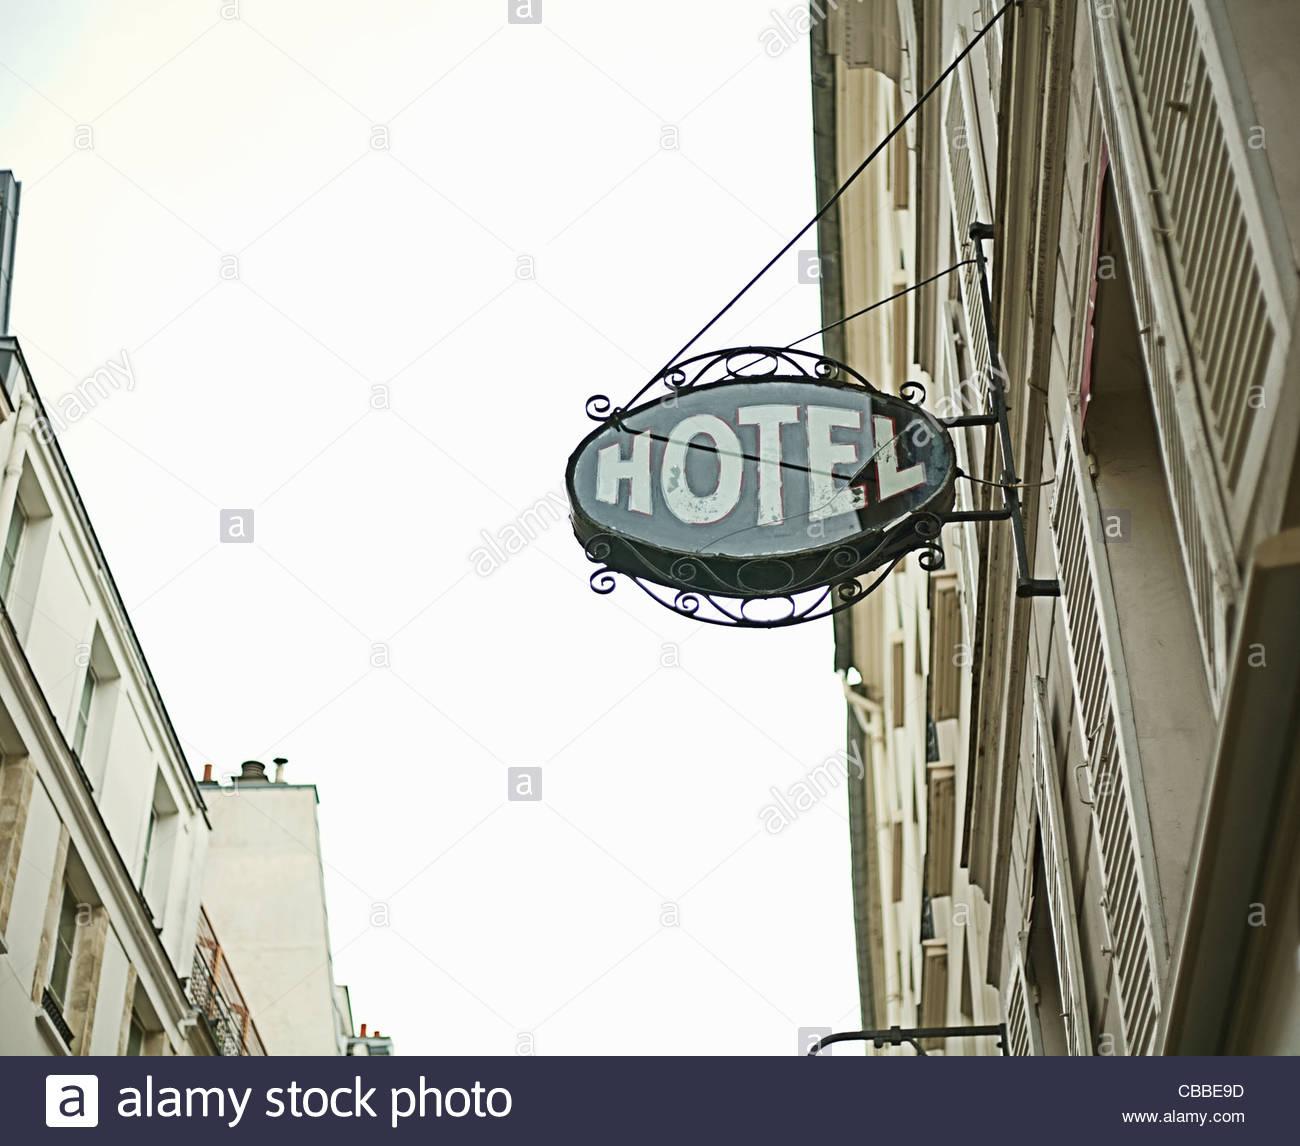 Hotel sign on city street - Stock Image